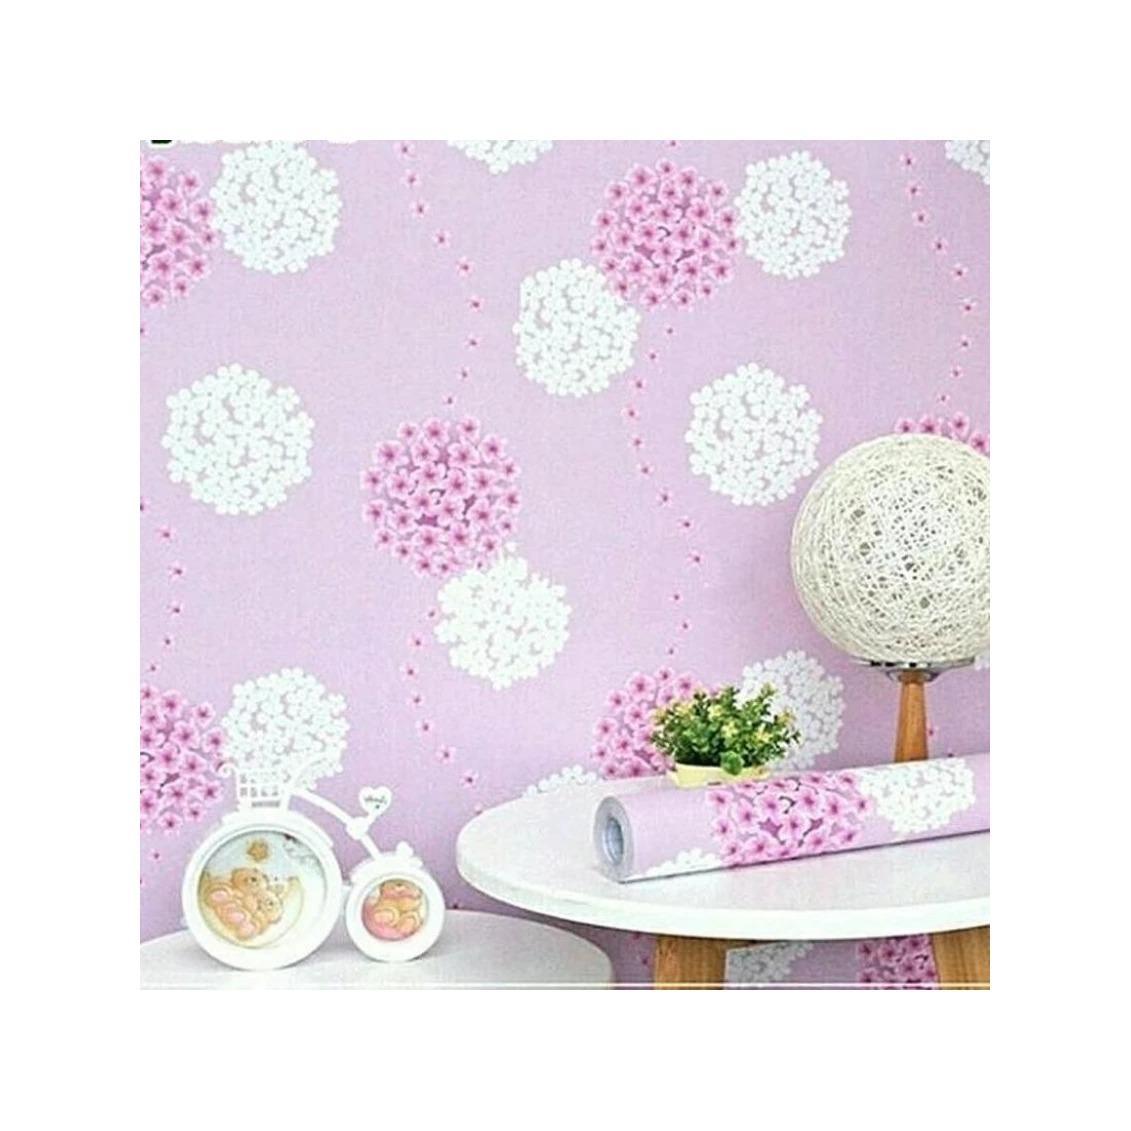 Restu_Ibu Wallpaper Sticker Cantik Motif Bunga Dandelion 45x10 Meter